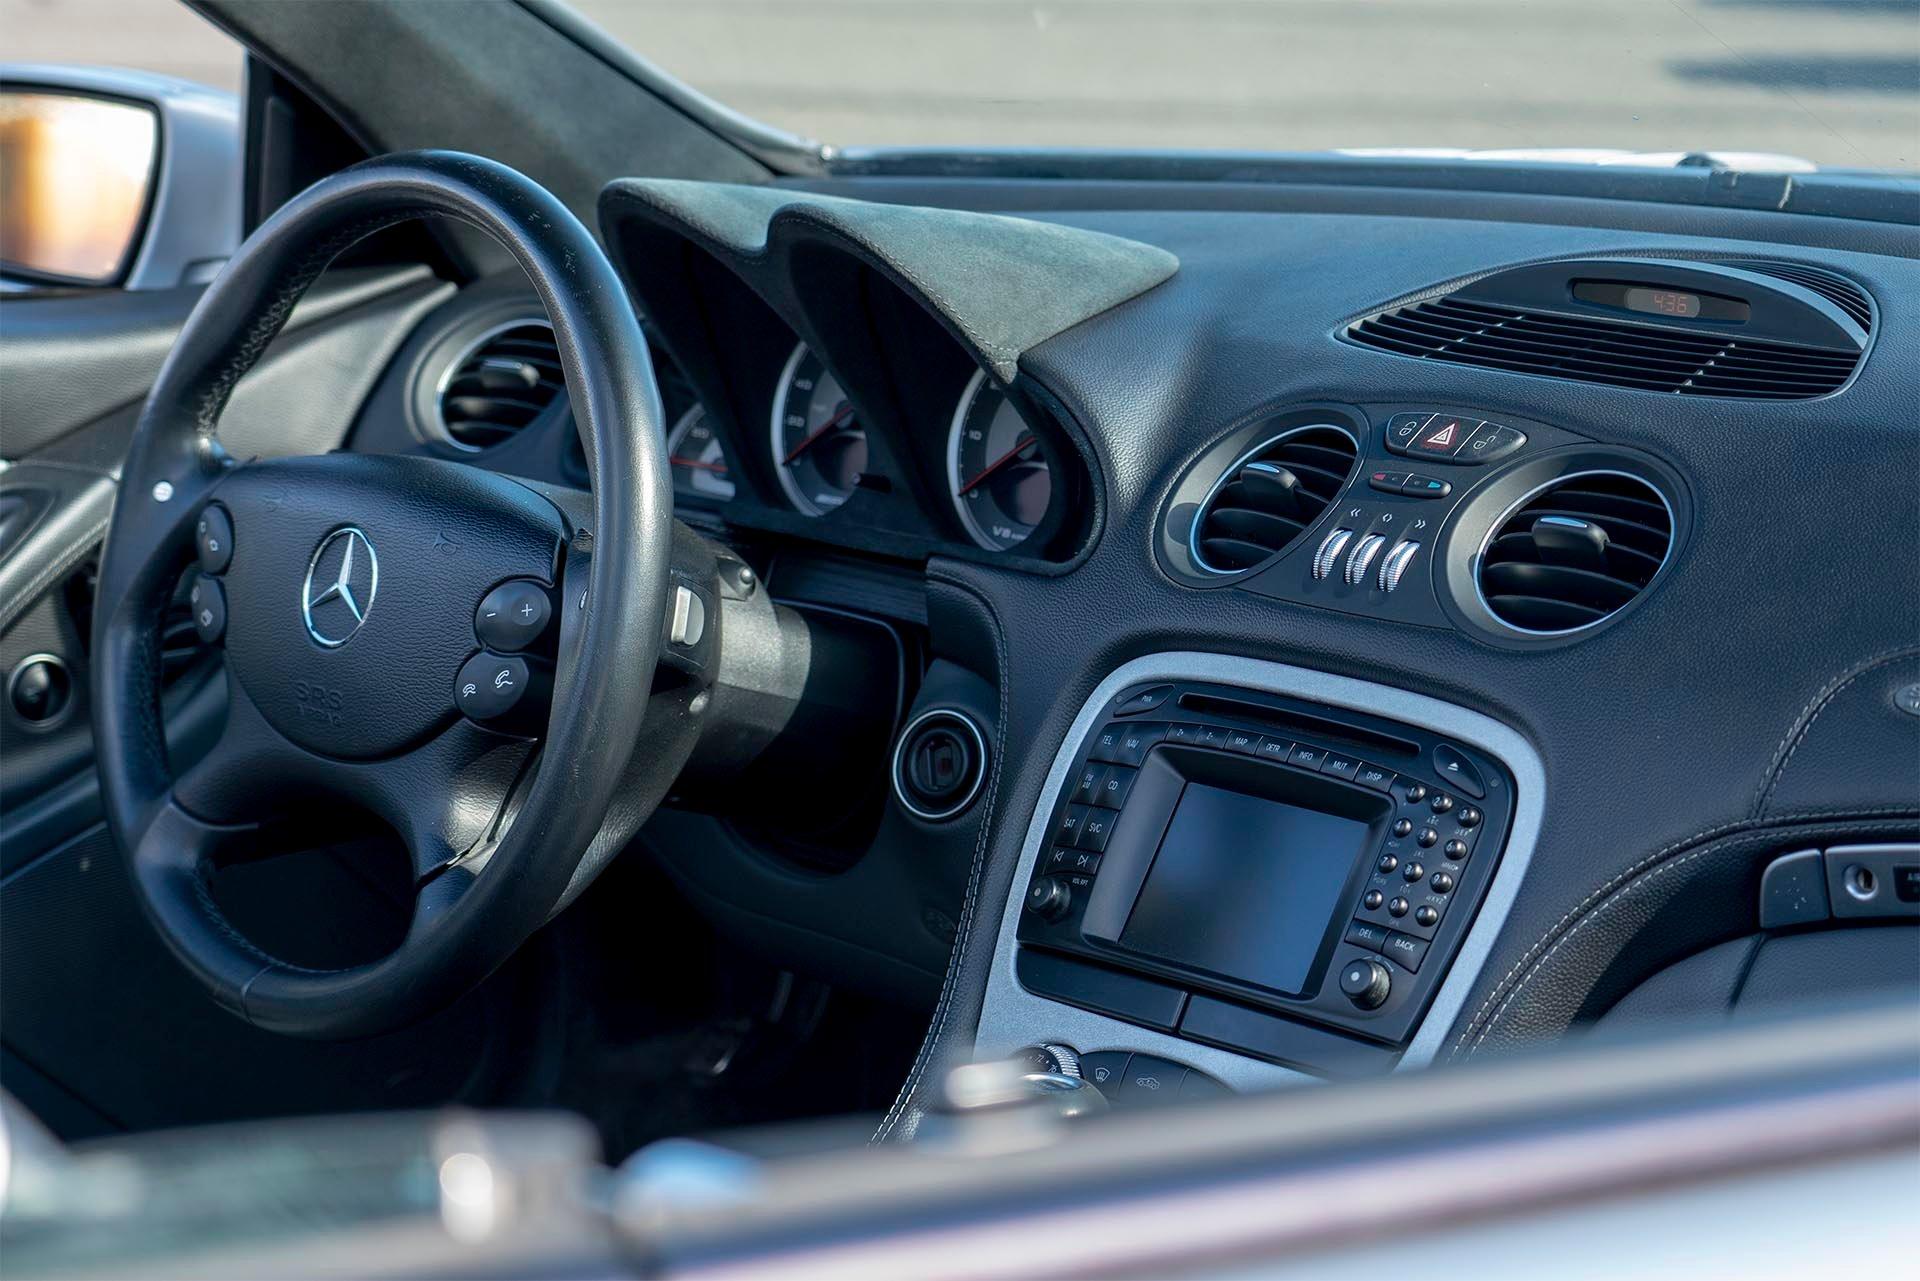 Mercedes-Benz SL55 AMG VRP Interior